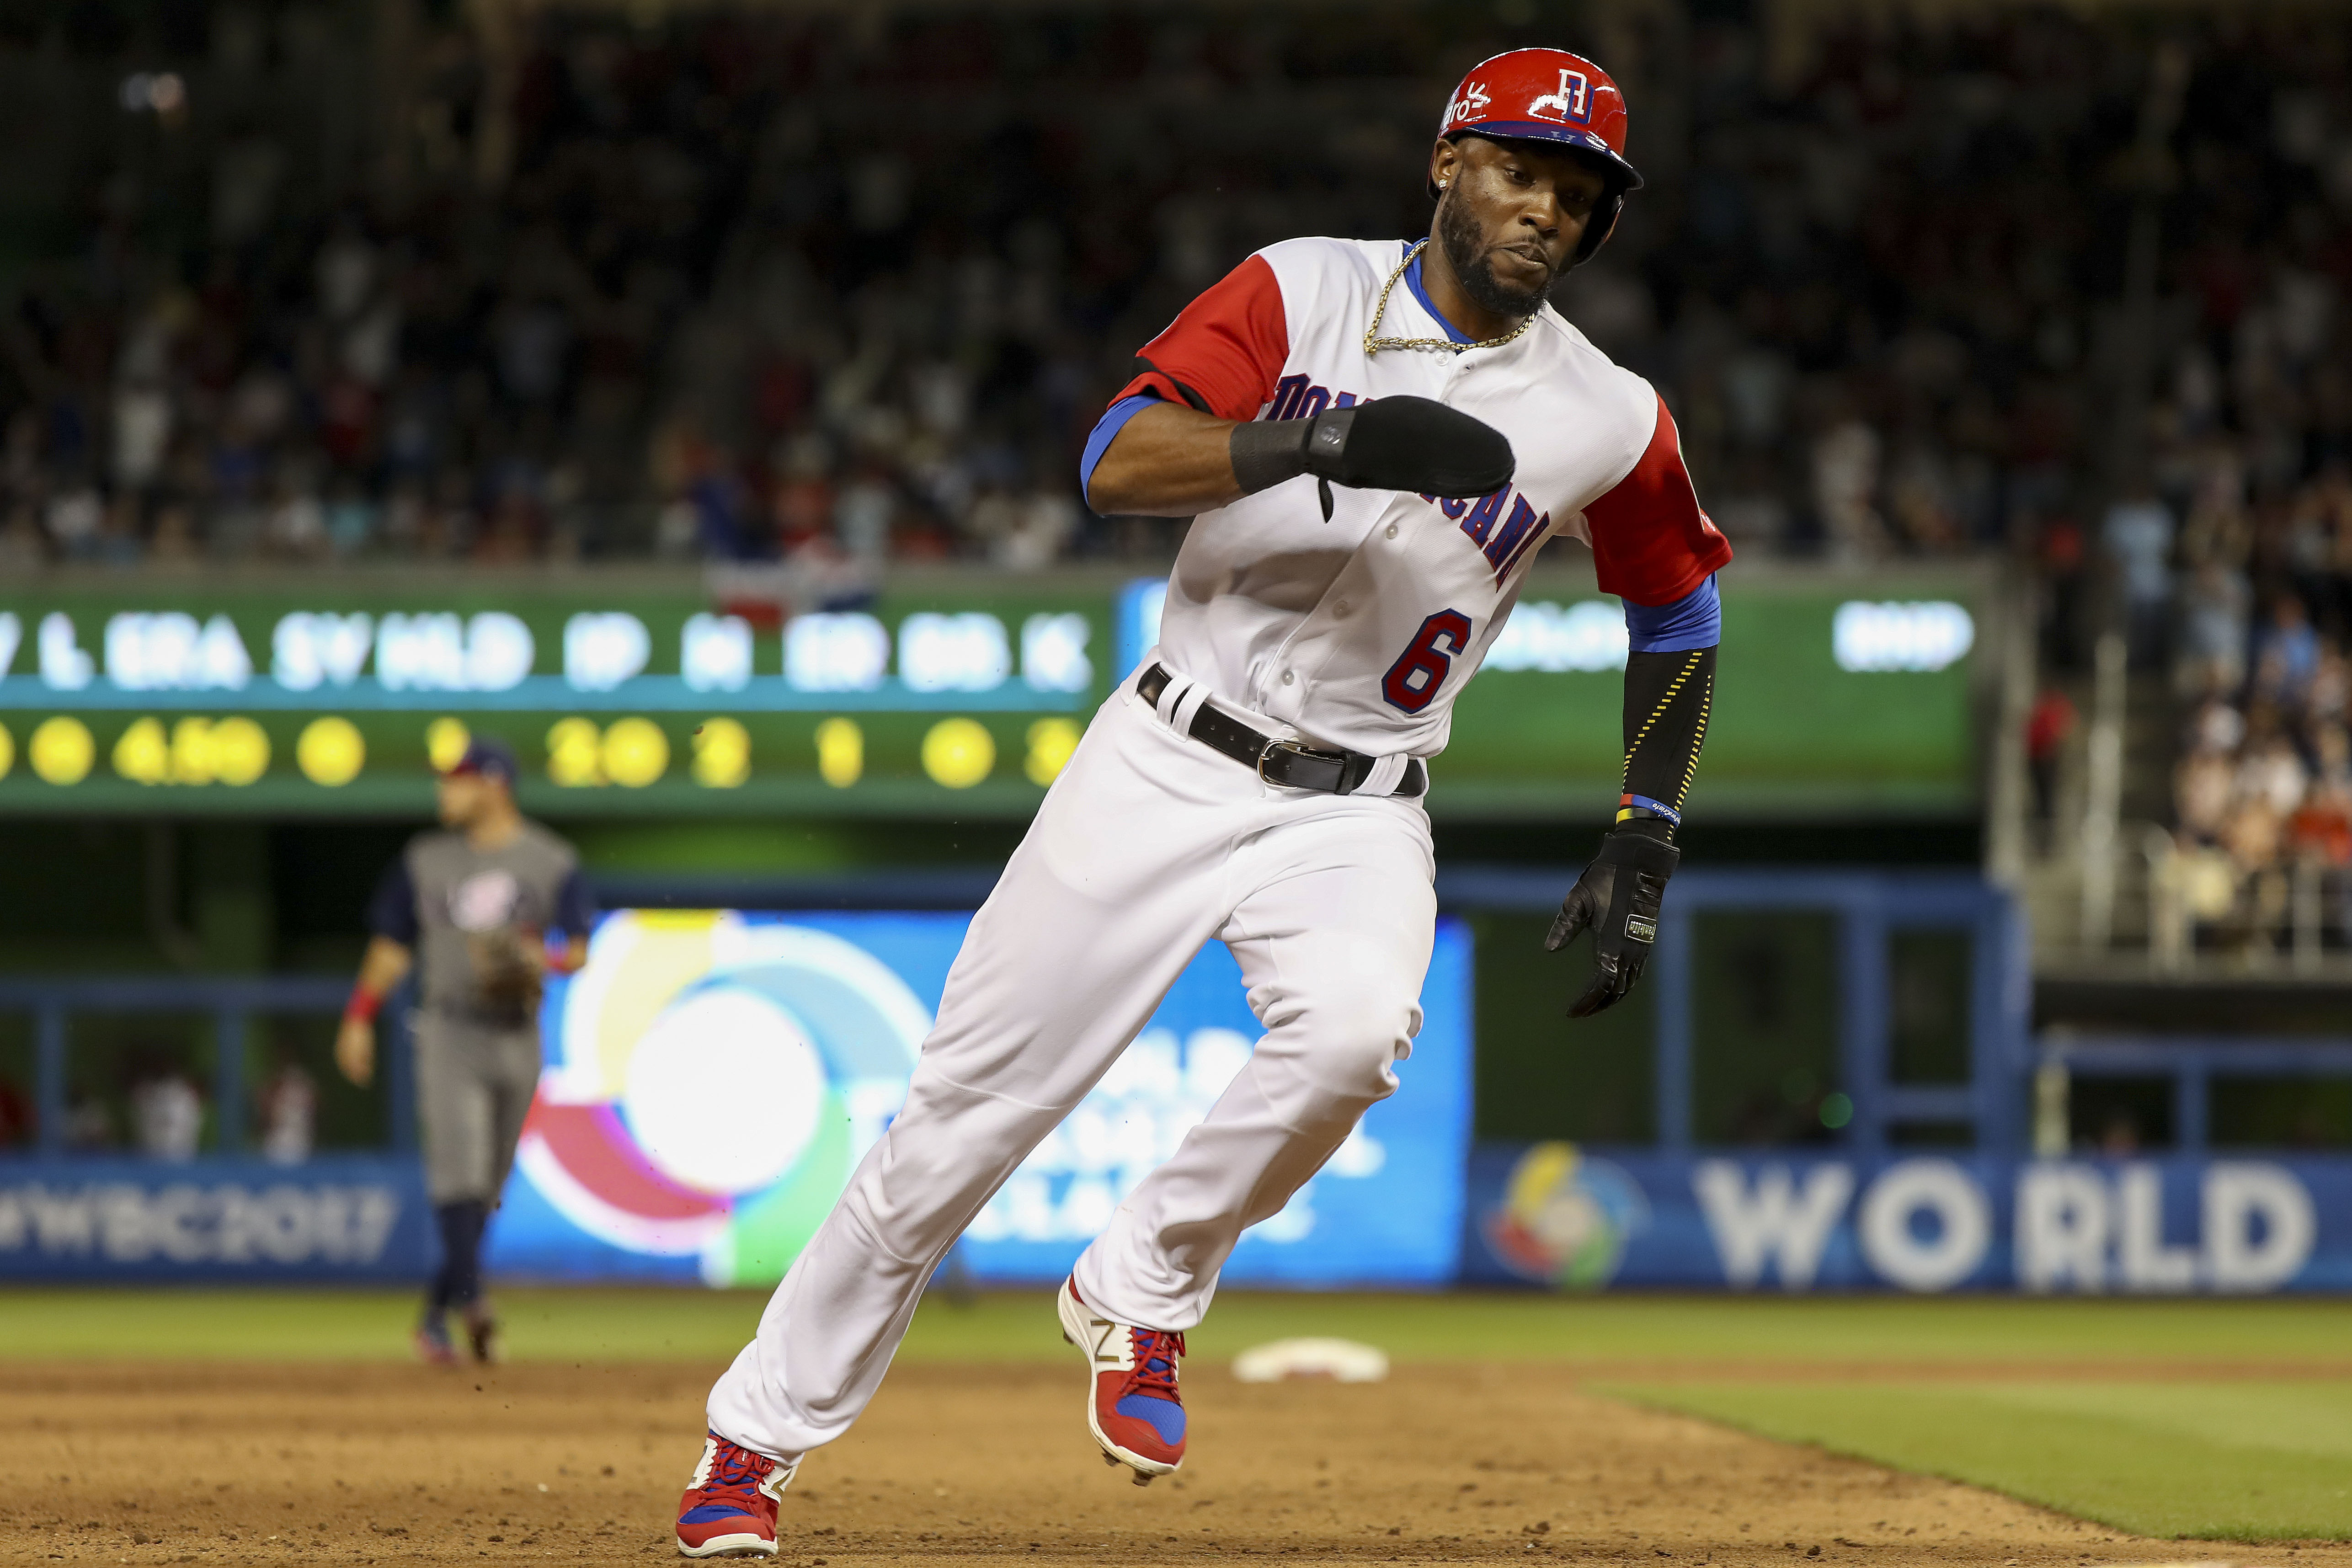 9935486-baseball-world-baseball-classic-usa-at-dominican-republic